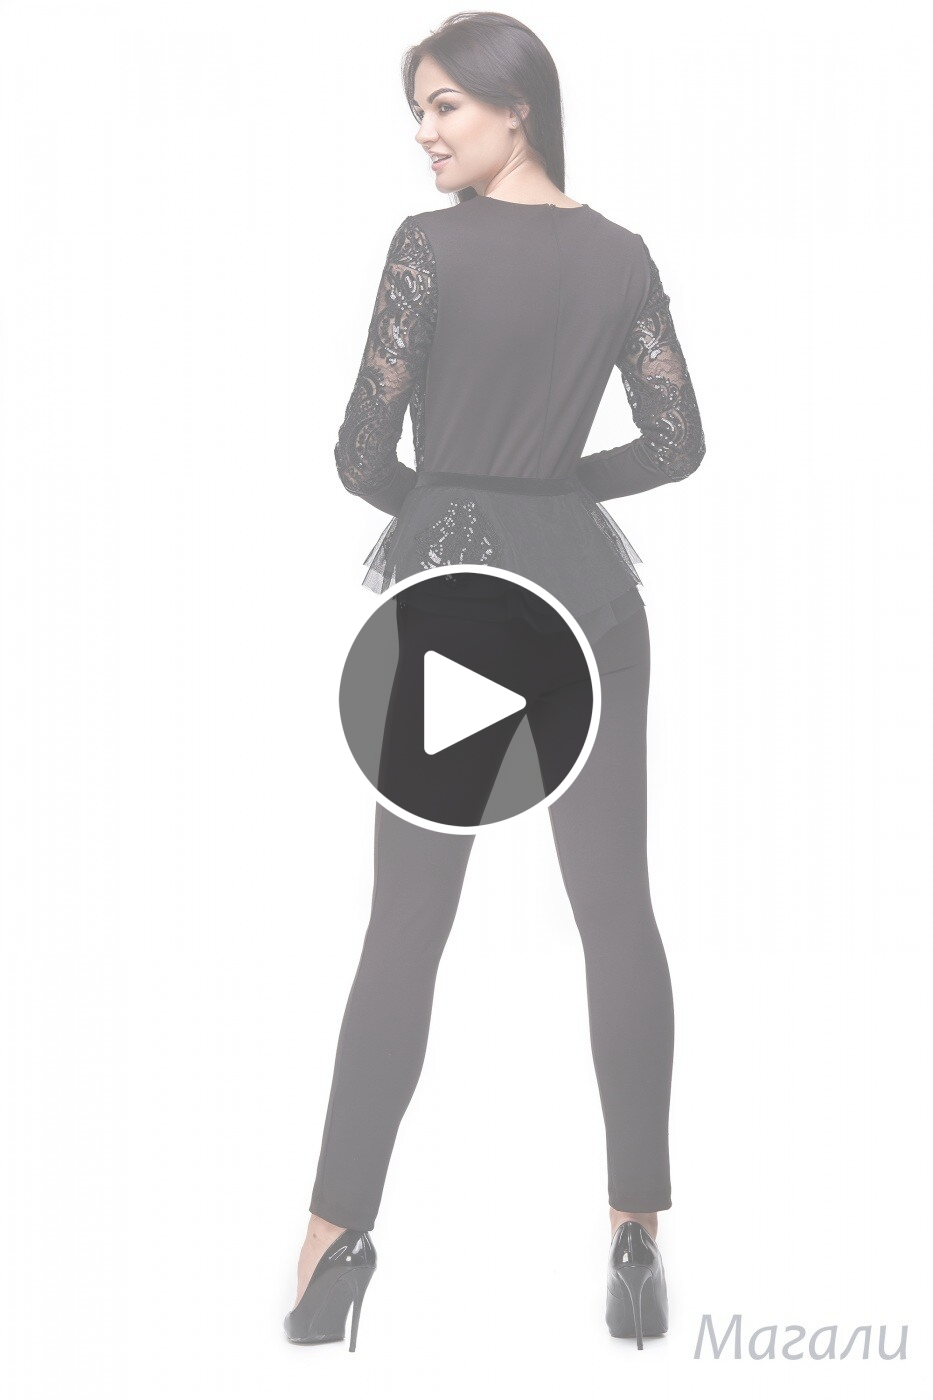 Angel PROVOCATION: Комбинезон + баска МАГАЛИ - перейти к видео товара